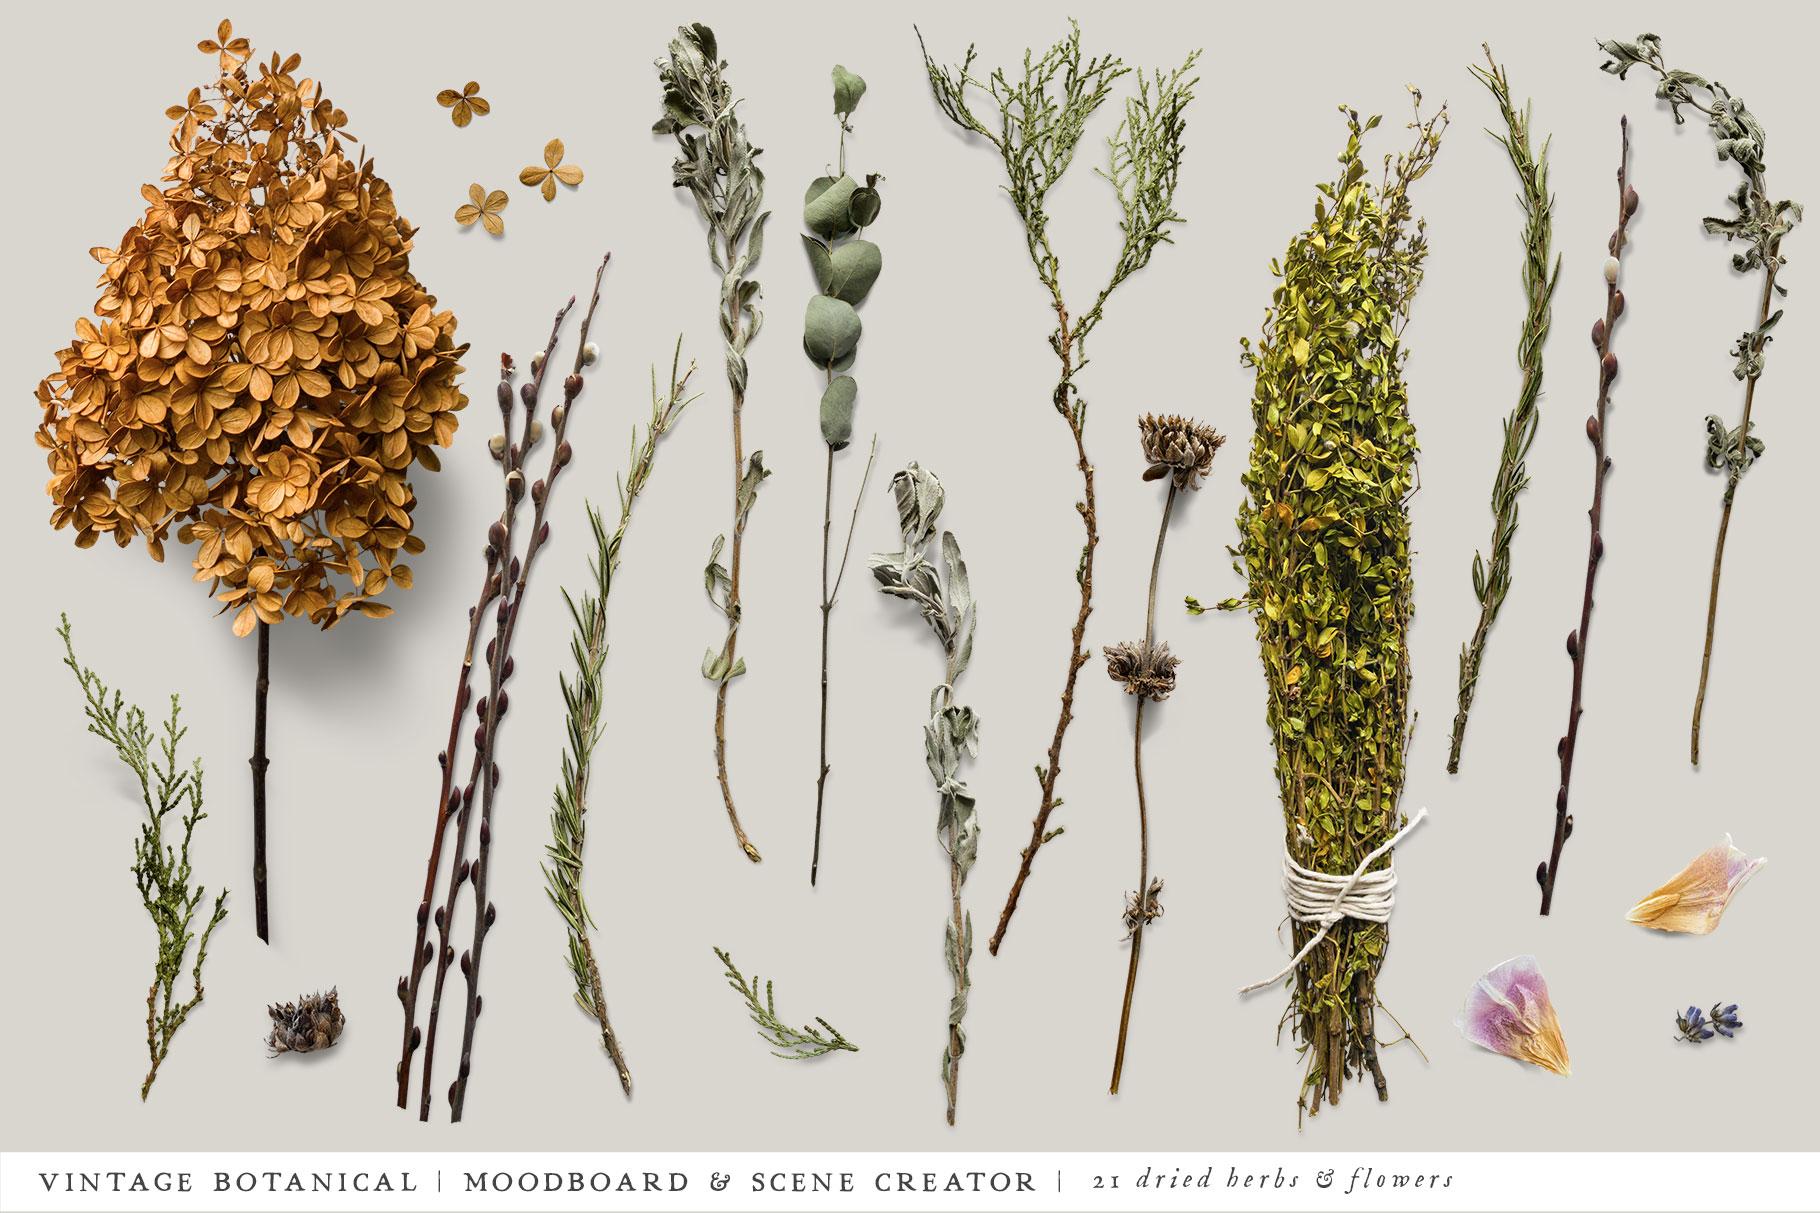 Botanical Moodboard Scene Creator example image 7